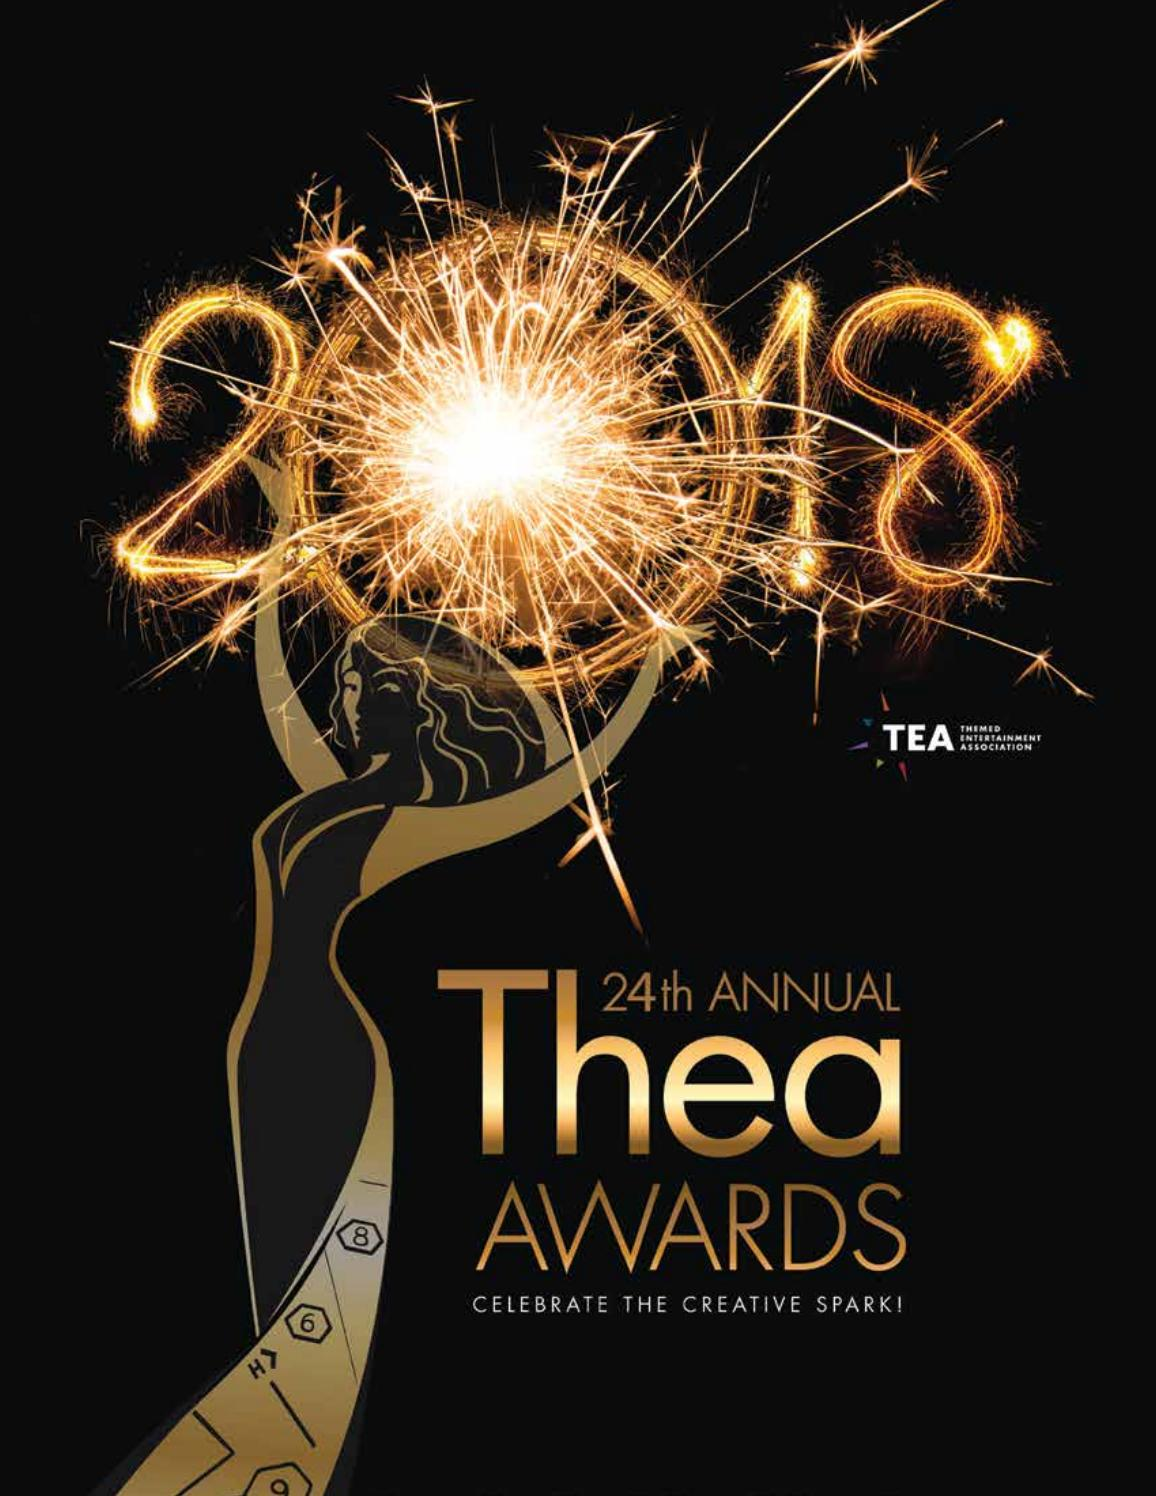 Tea Thea Awards Program 2018 24th Annual By Themed Entertainment Catriona Maika Top Handle Bag Black Association Issuu